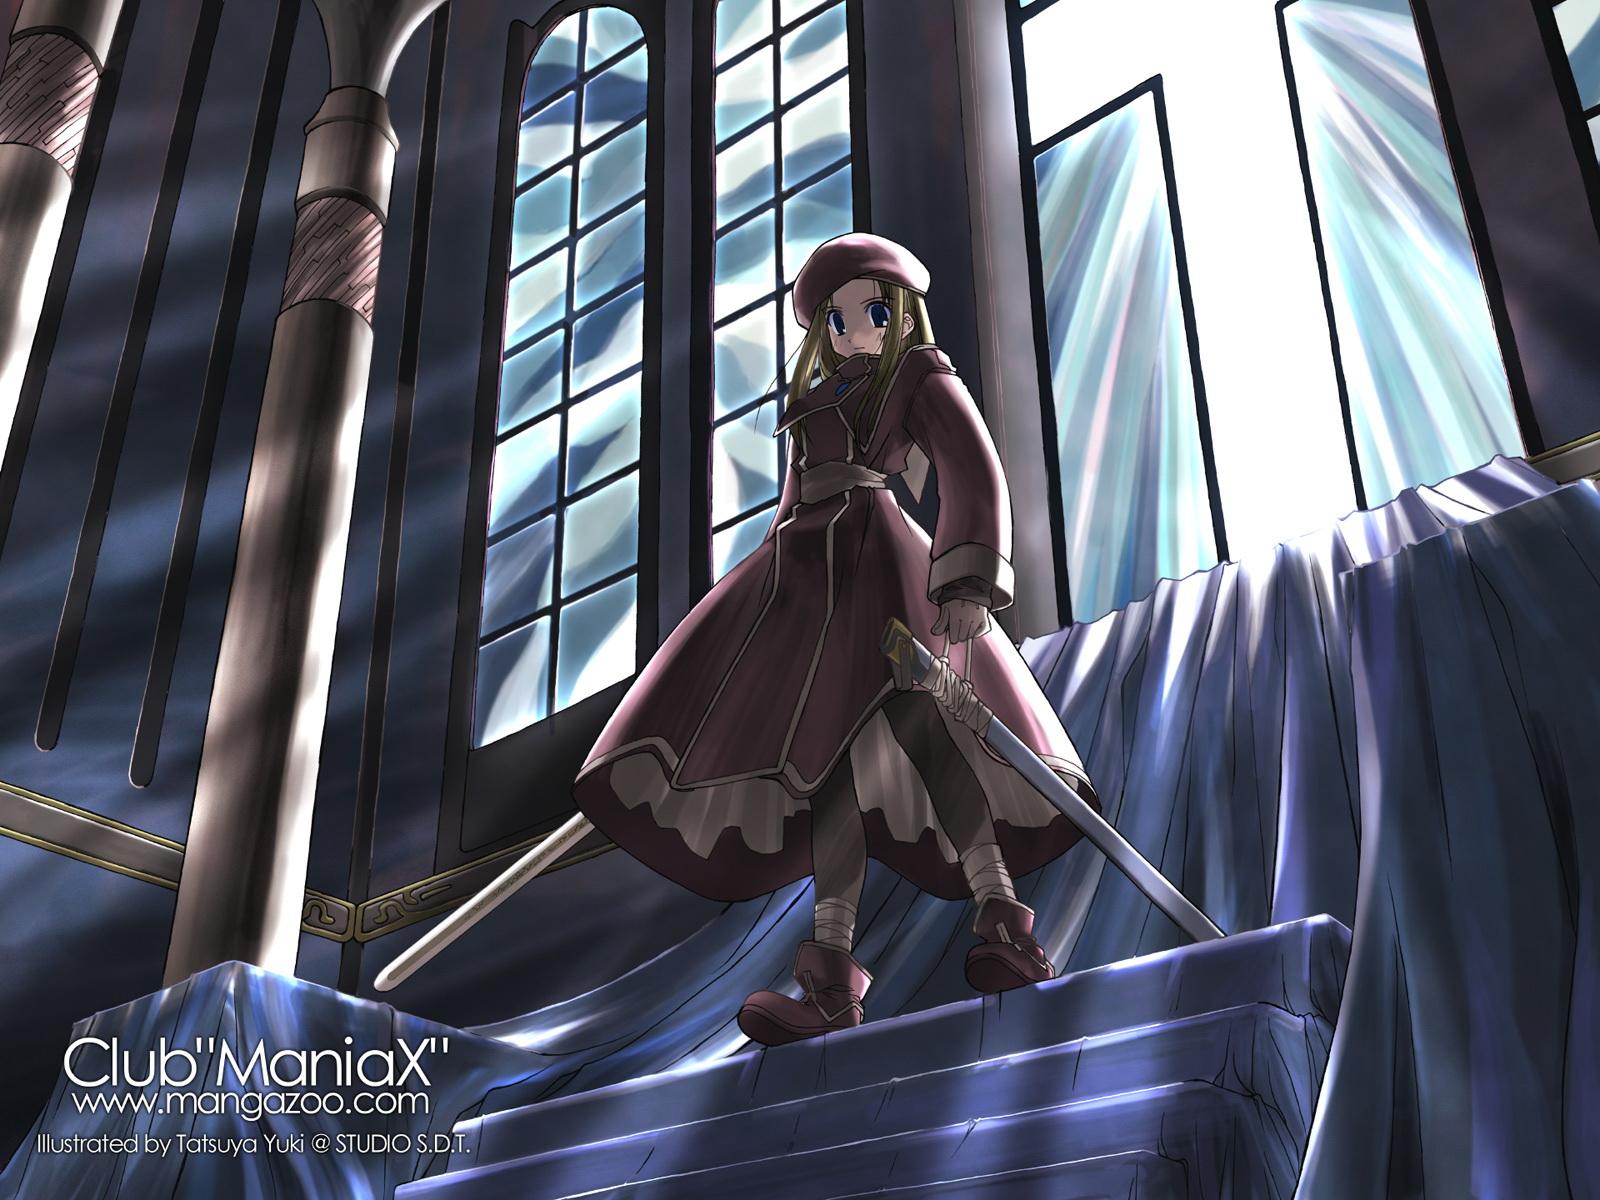 club_maniax stairs sword weapon yuuki_tatsuya